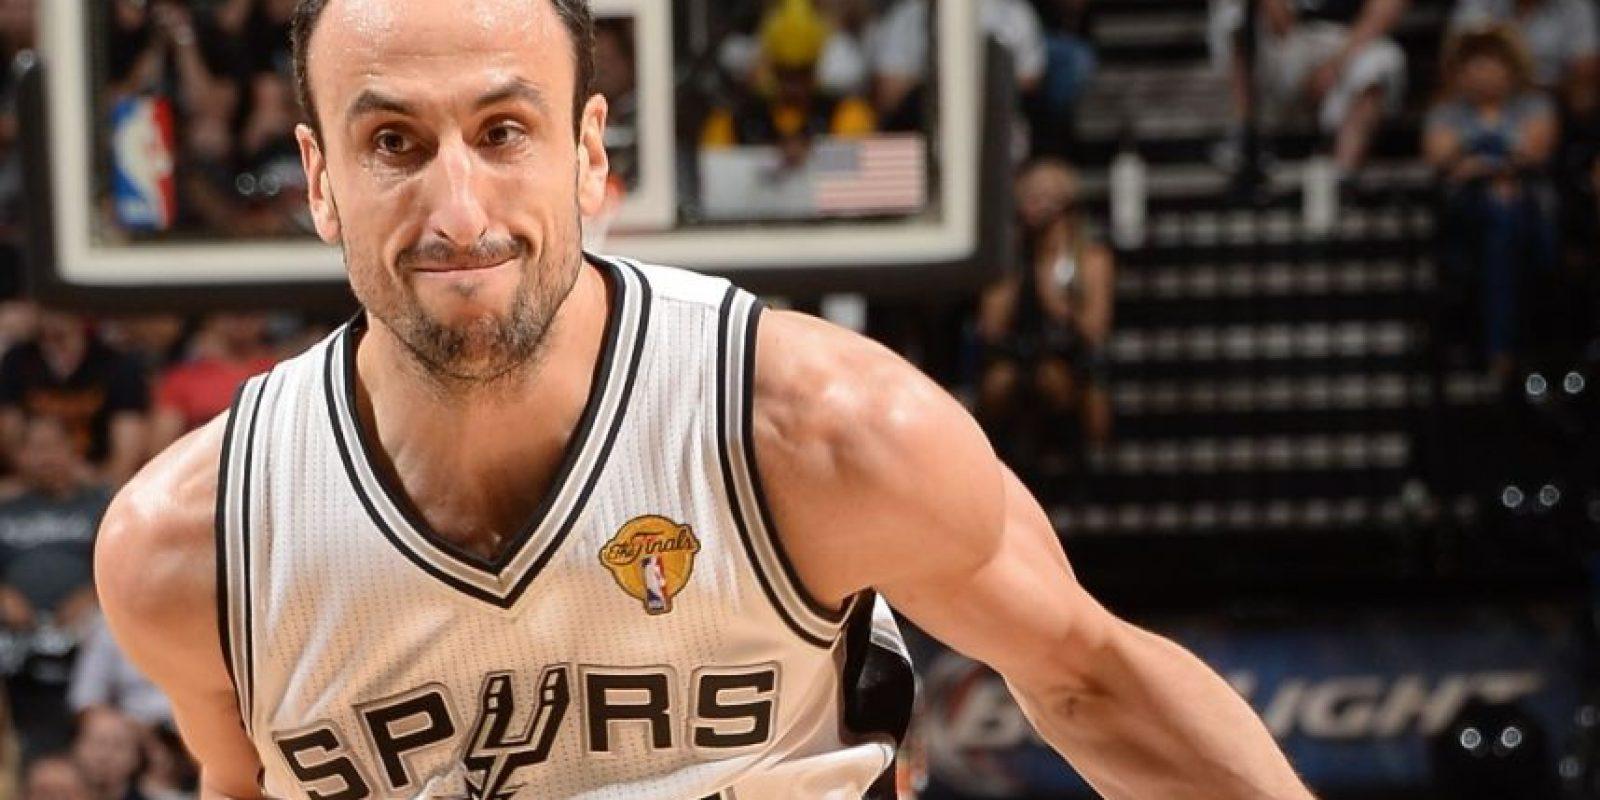 Emanuel Ginóbili, jugador de baloncesto argentino. Foto:Publinews